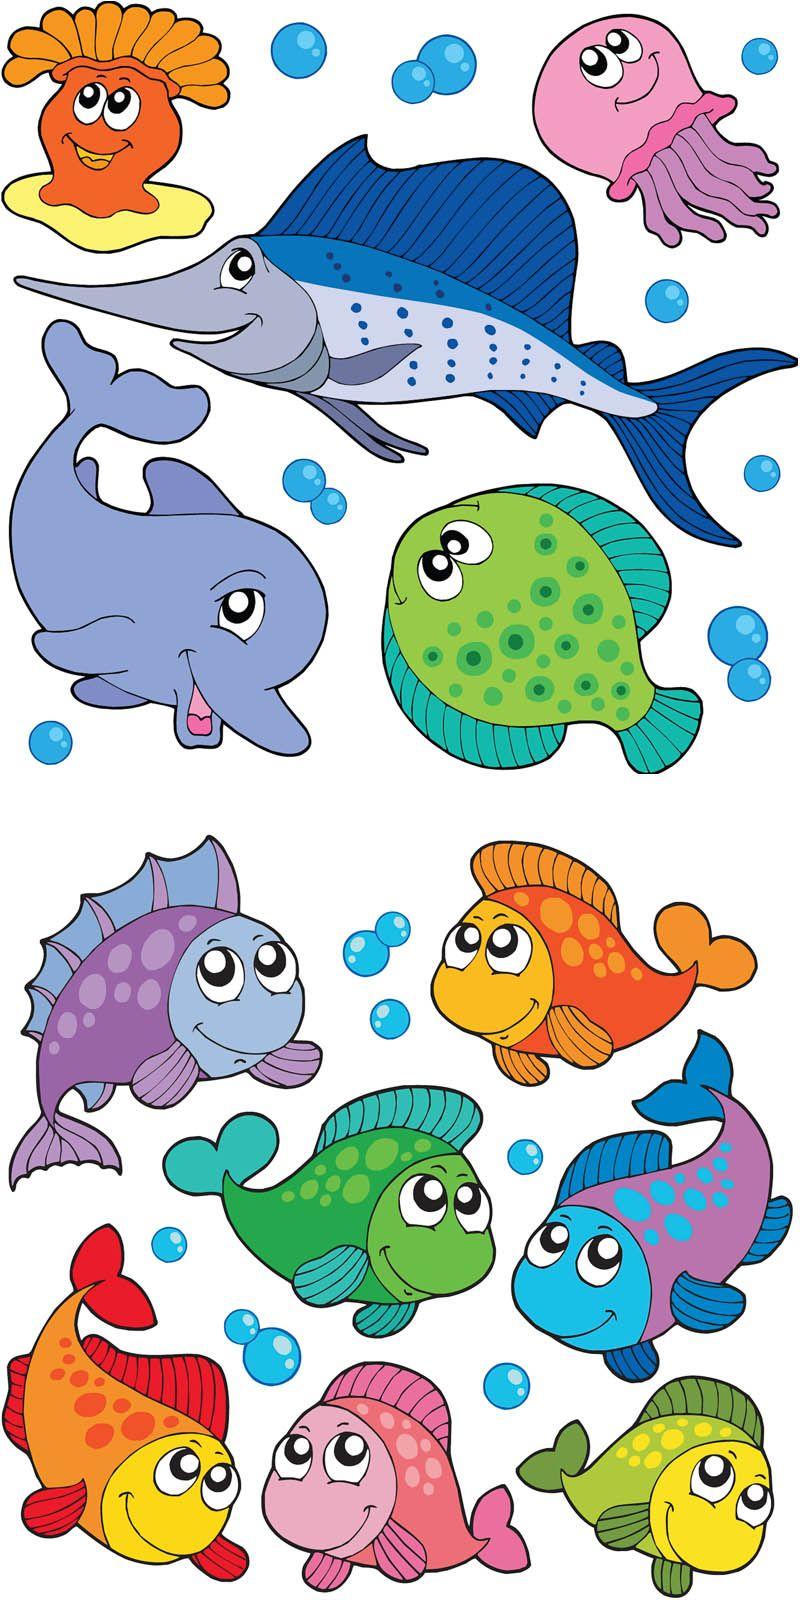 Summer beach scene vector stock vector colourbox - Set Of 12 Colorful Vector Cartoon Fishes Templates Cartoon Dolphin Needlefish Jellyfish